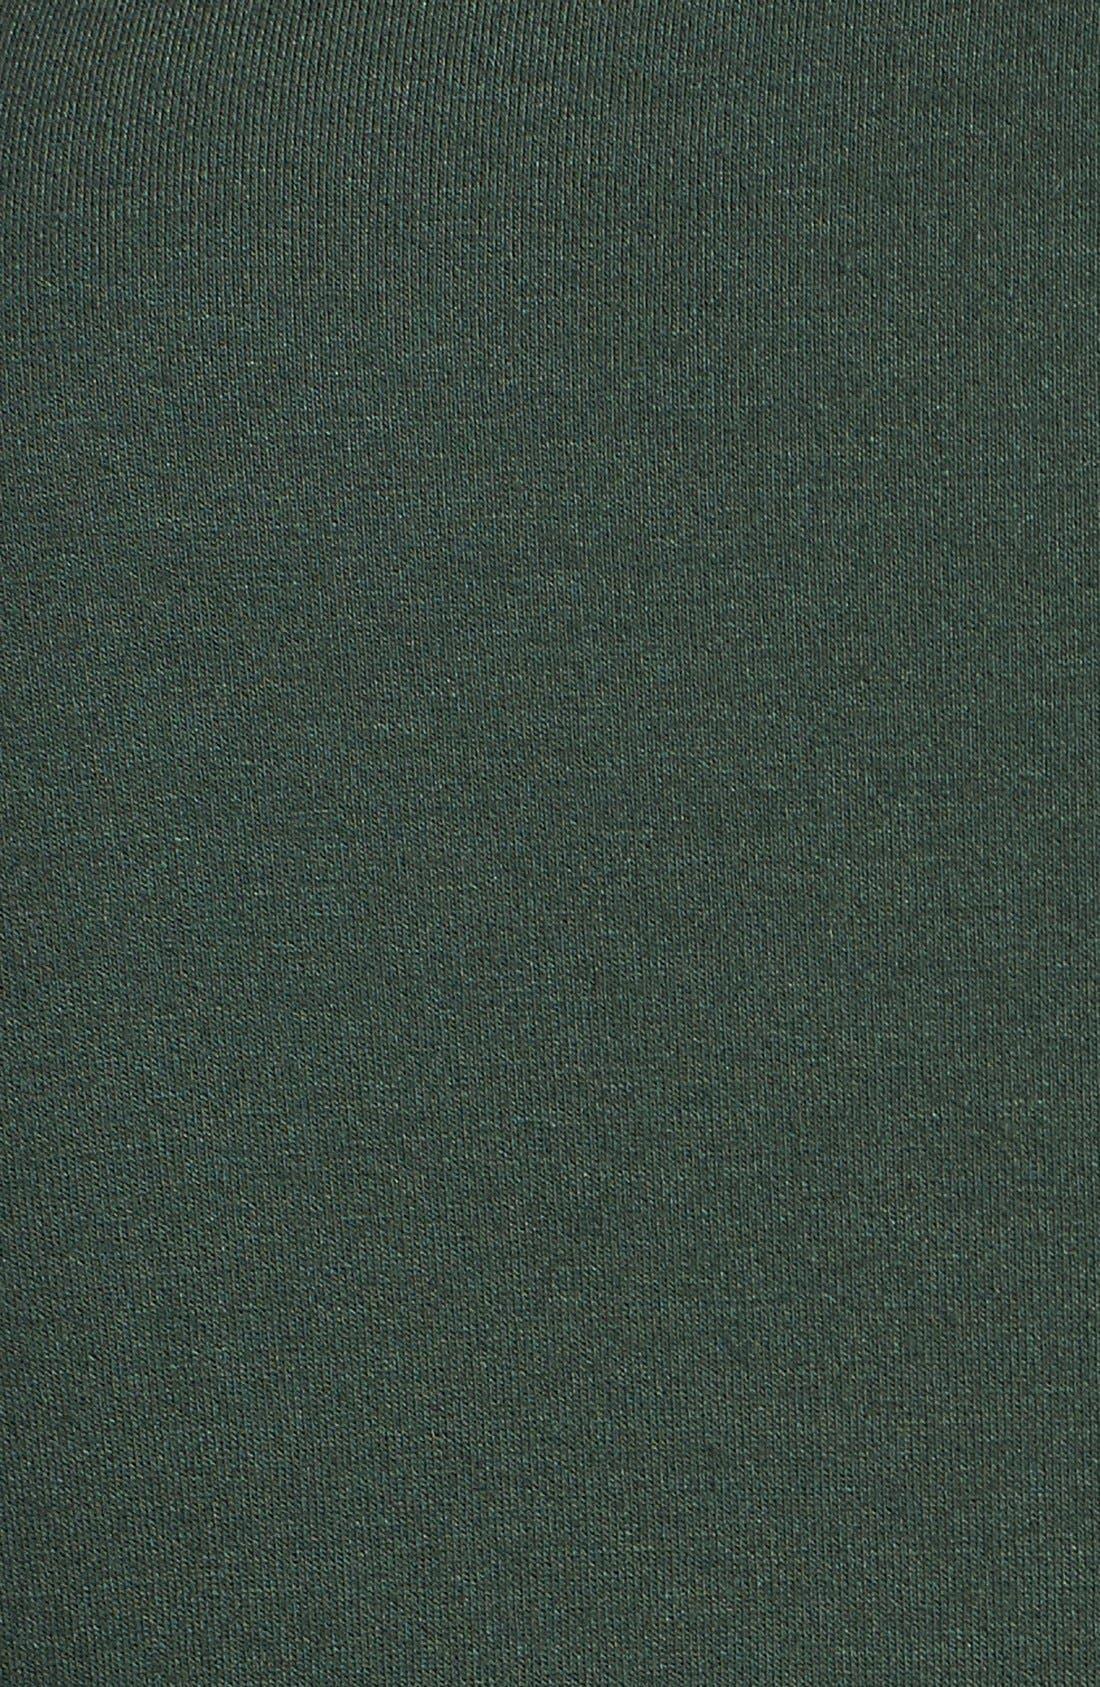 Alternate Image 2  - Vince Camuto Jersey Wrap Top (Plus Size)